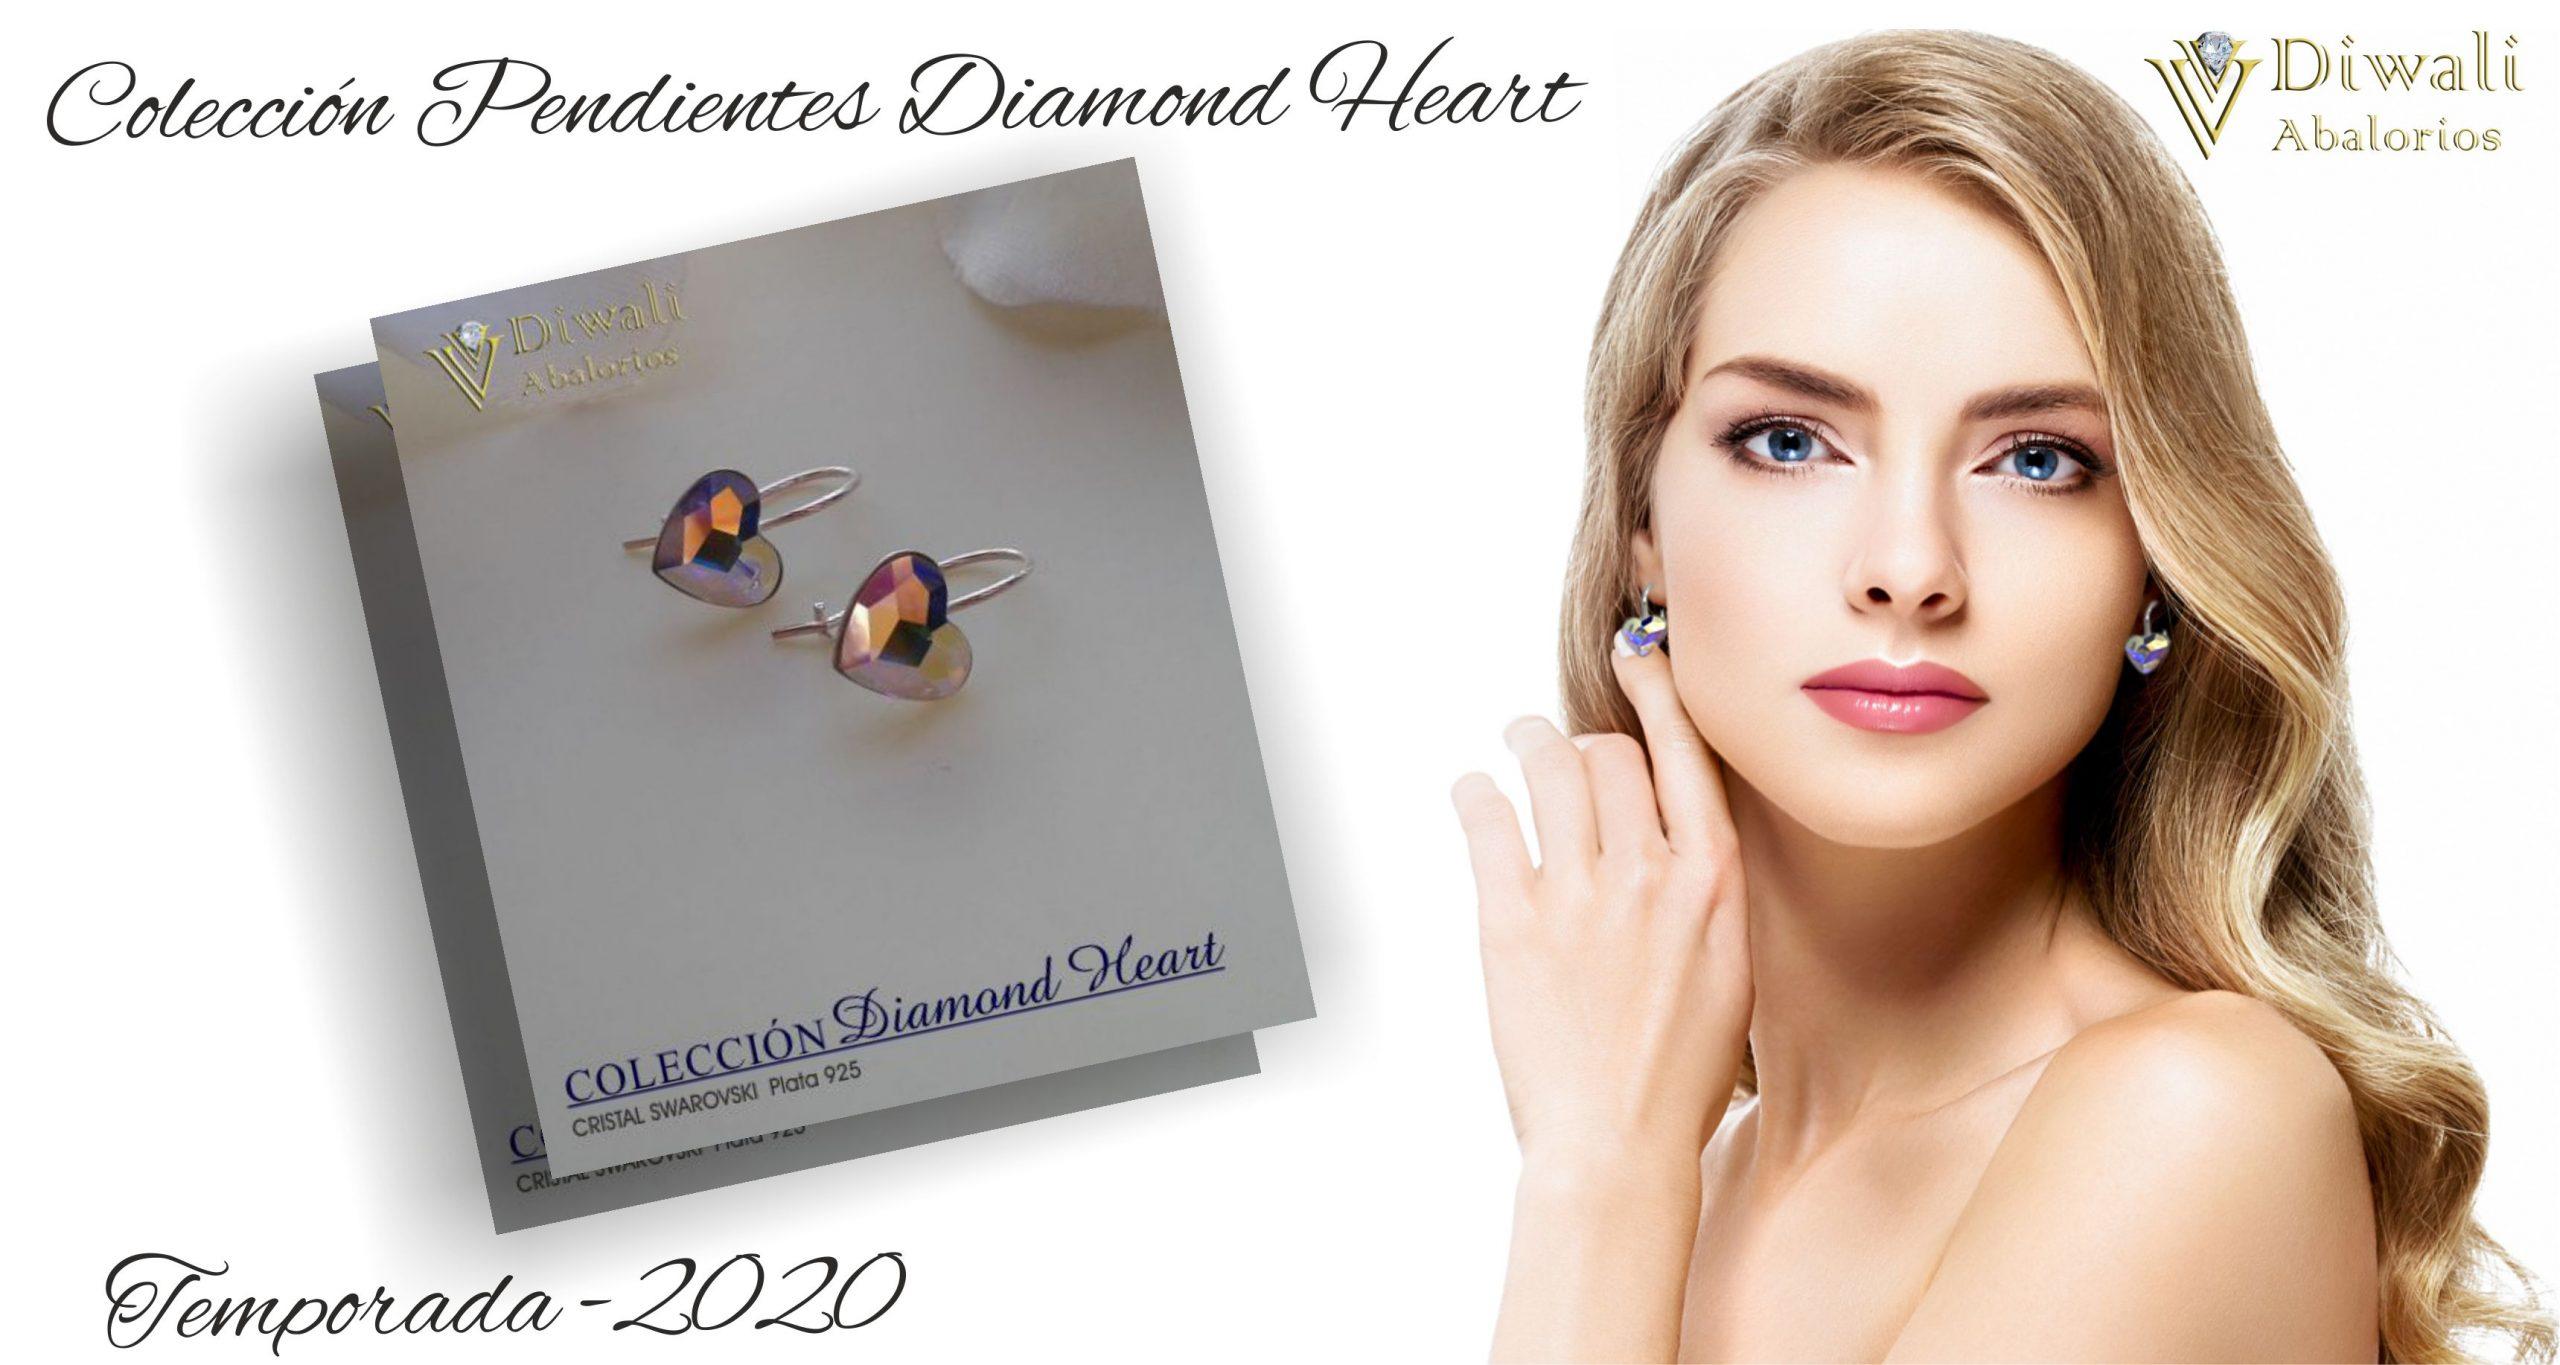 PORTADA DIAMOND HEART